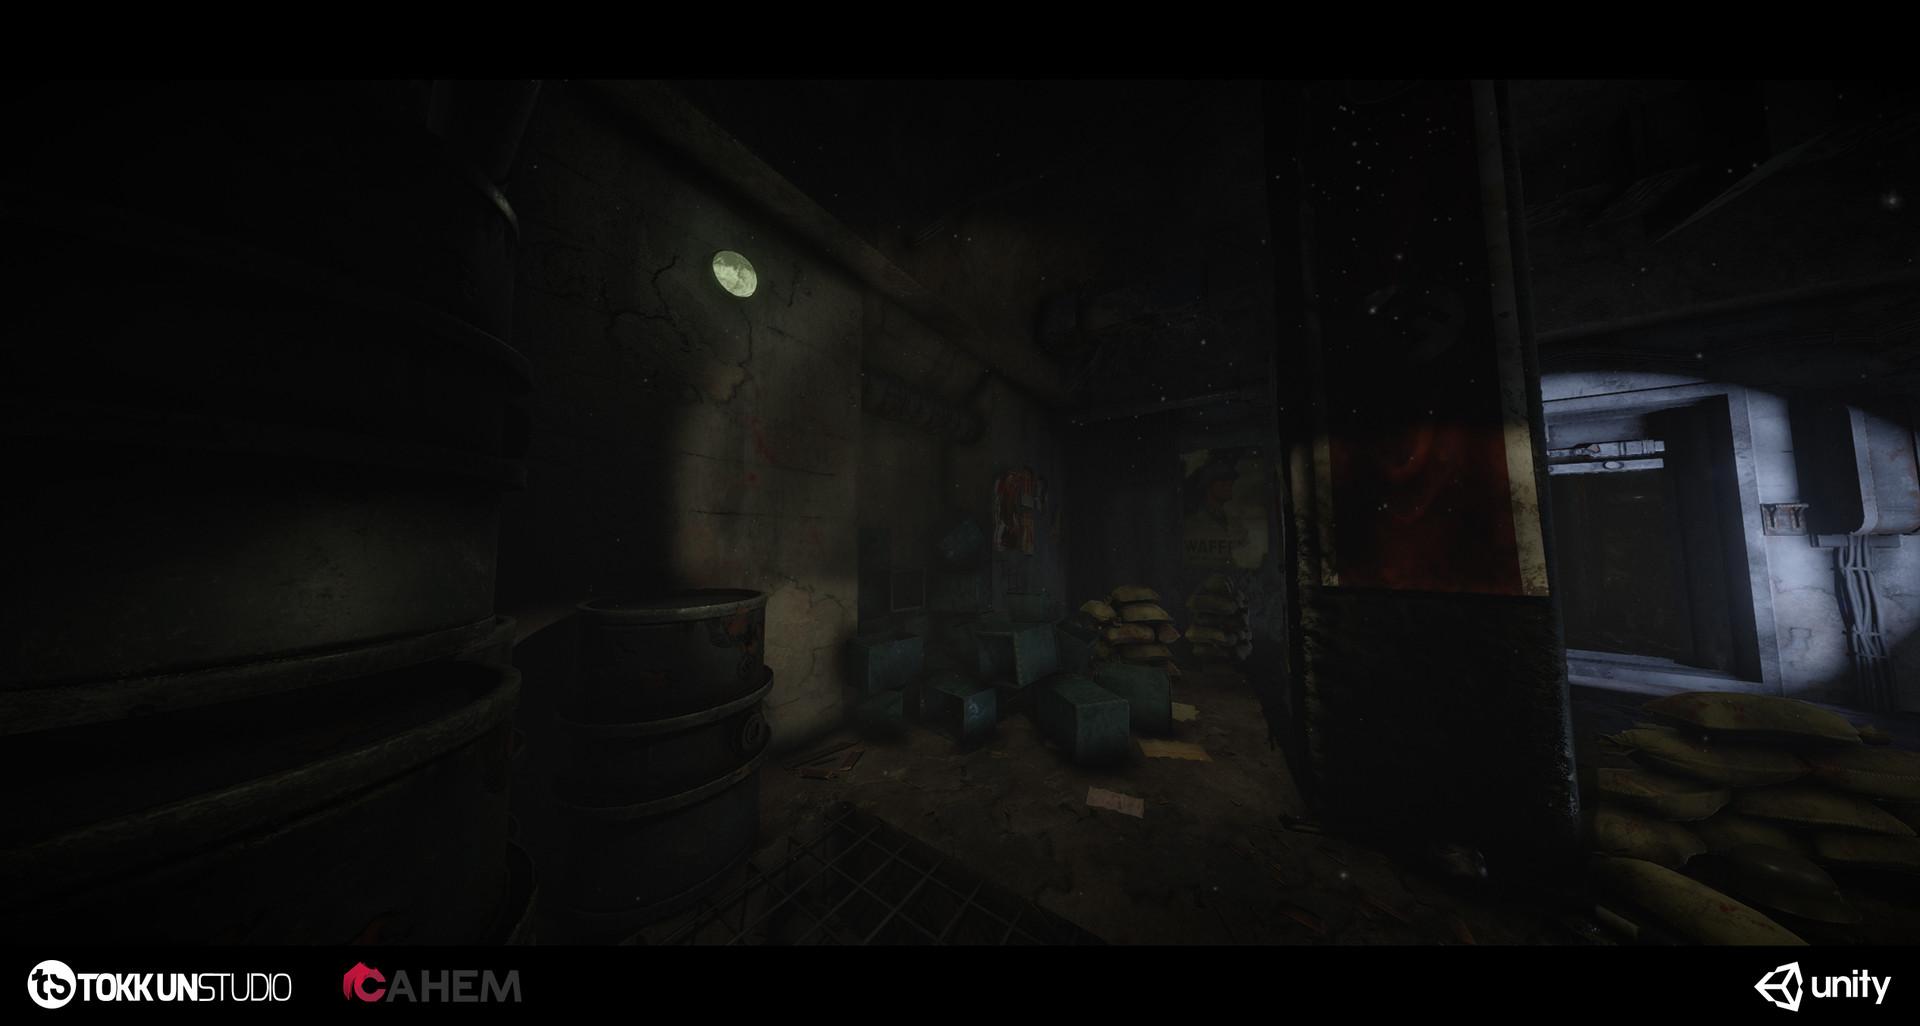 Tokkun studio bunker shot 28